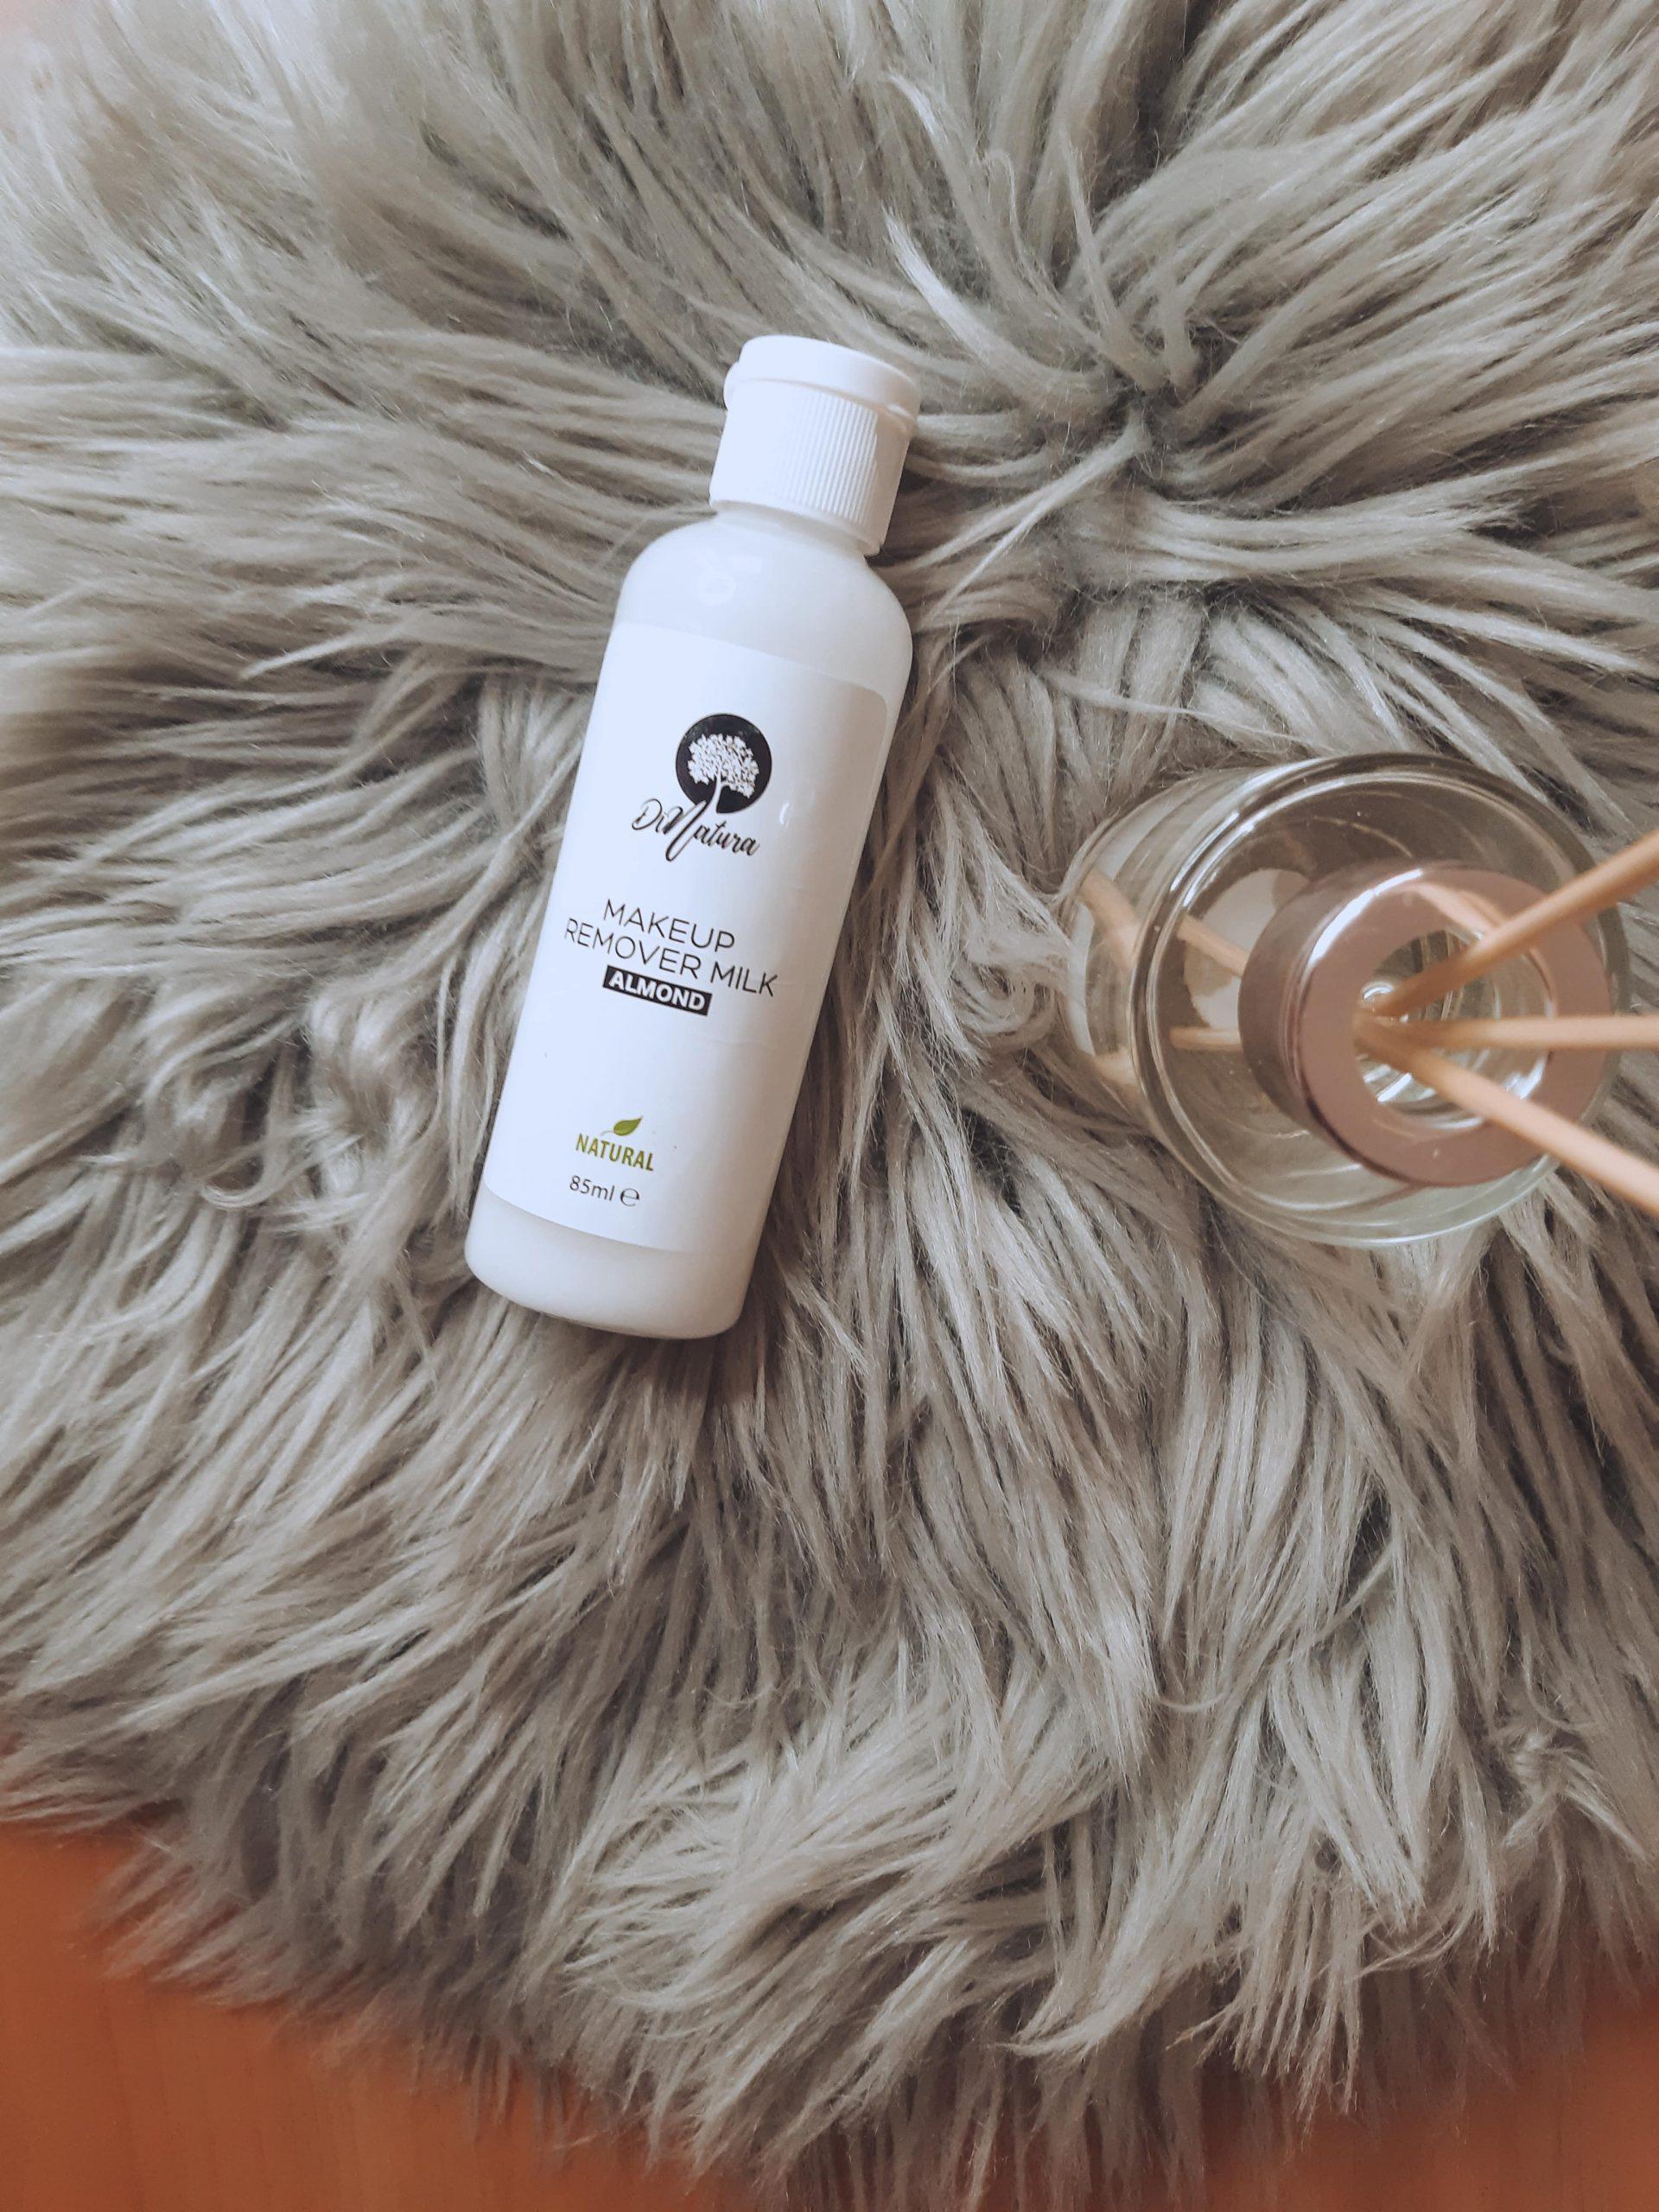 dinatura makeup remover milk recenzija review almond livinglikev fashion blogger living like v fashion blogger